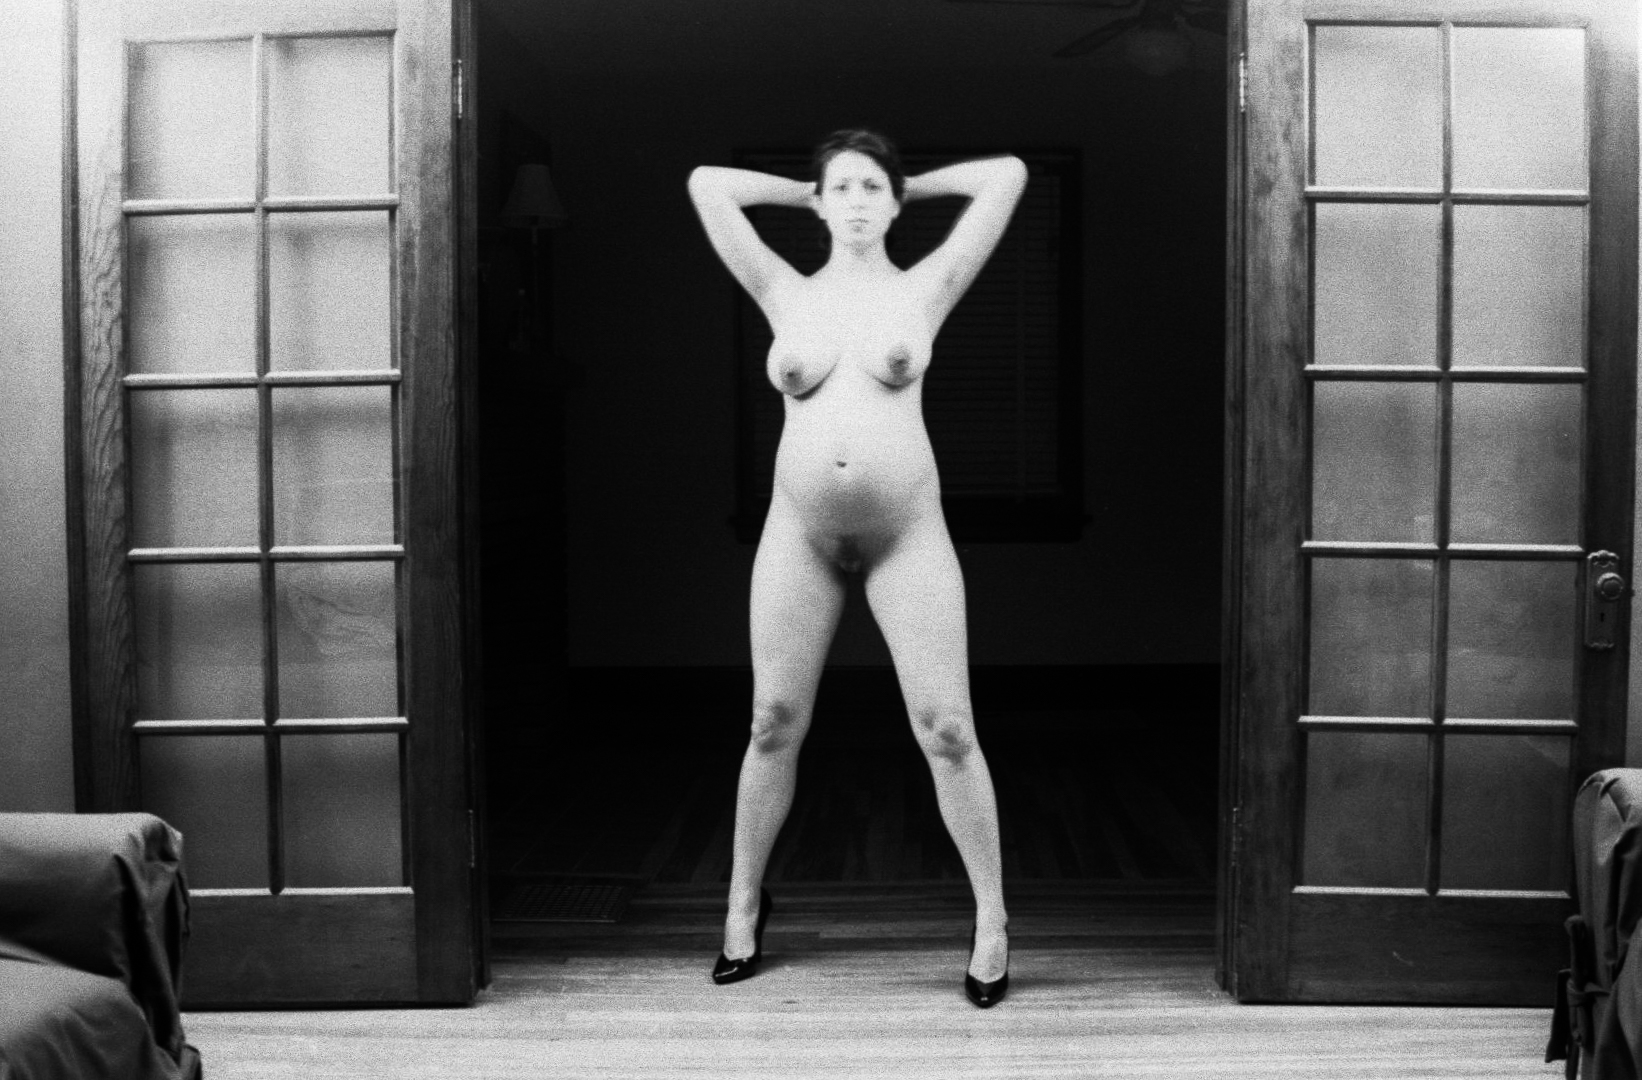 2004-gtrimble-hannah-portrait-pregnant-3.jpg